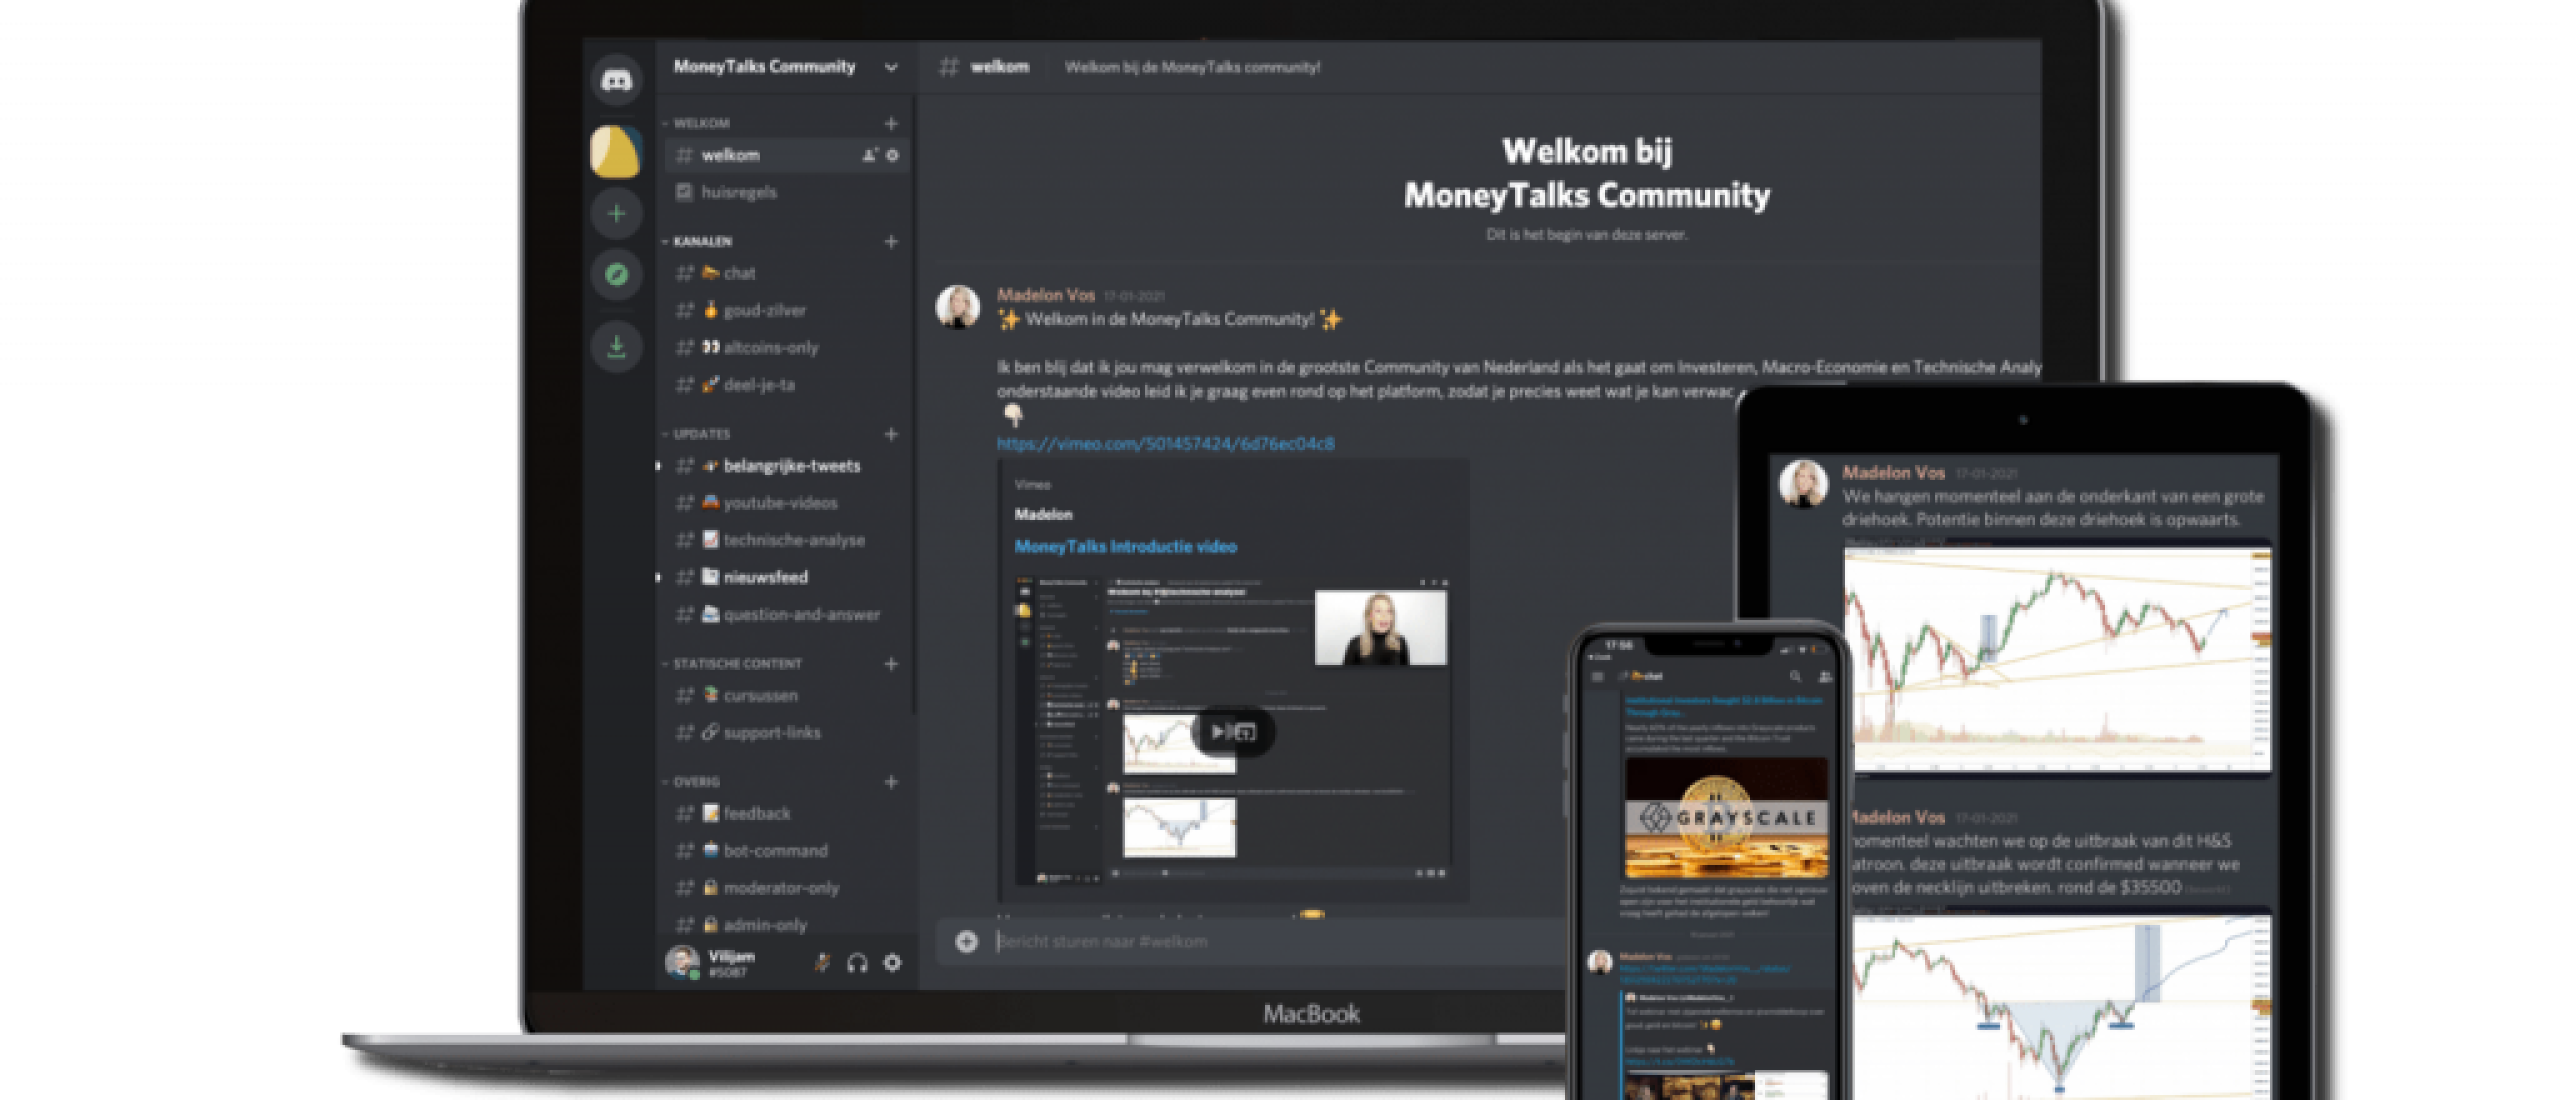 MoneyTalks Community review en ervaringen van Madelon Vos